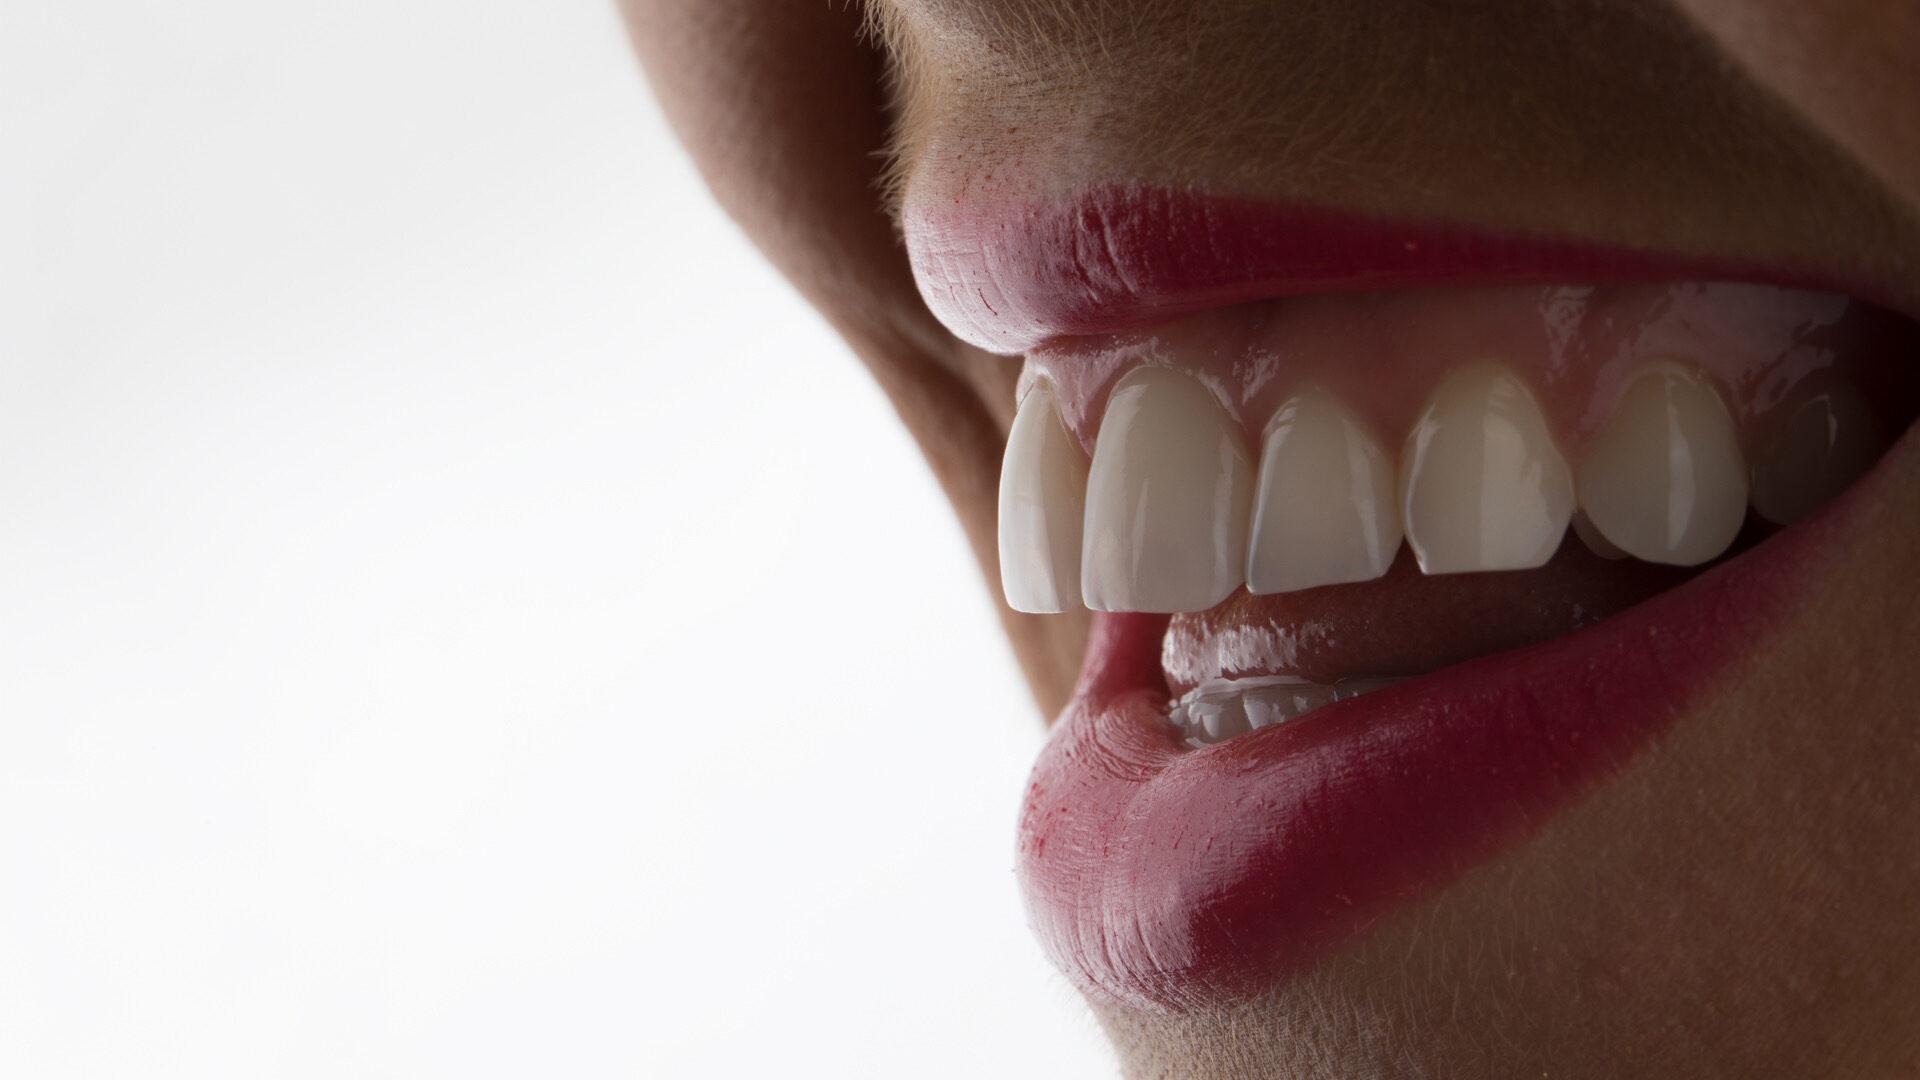 Dental photography essentials 2